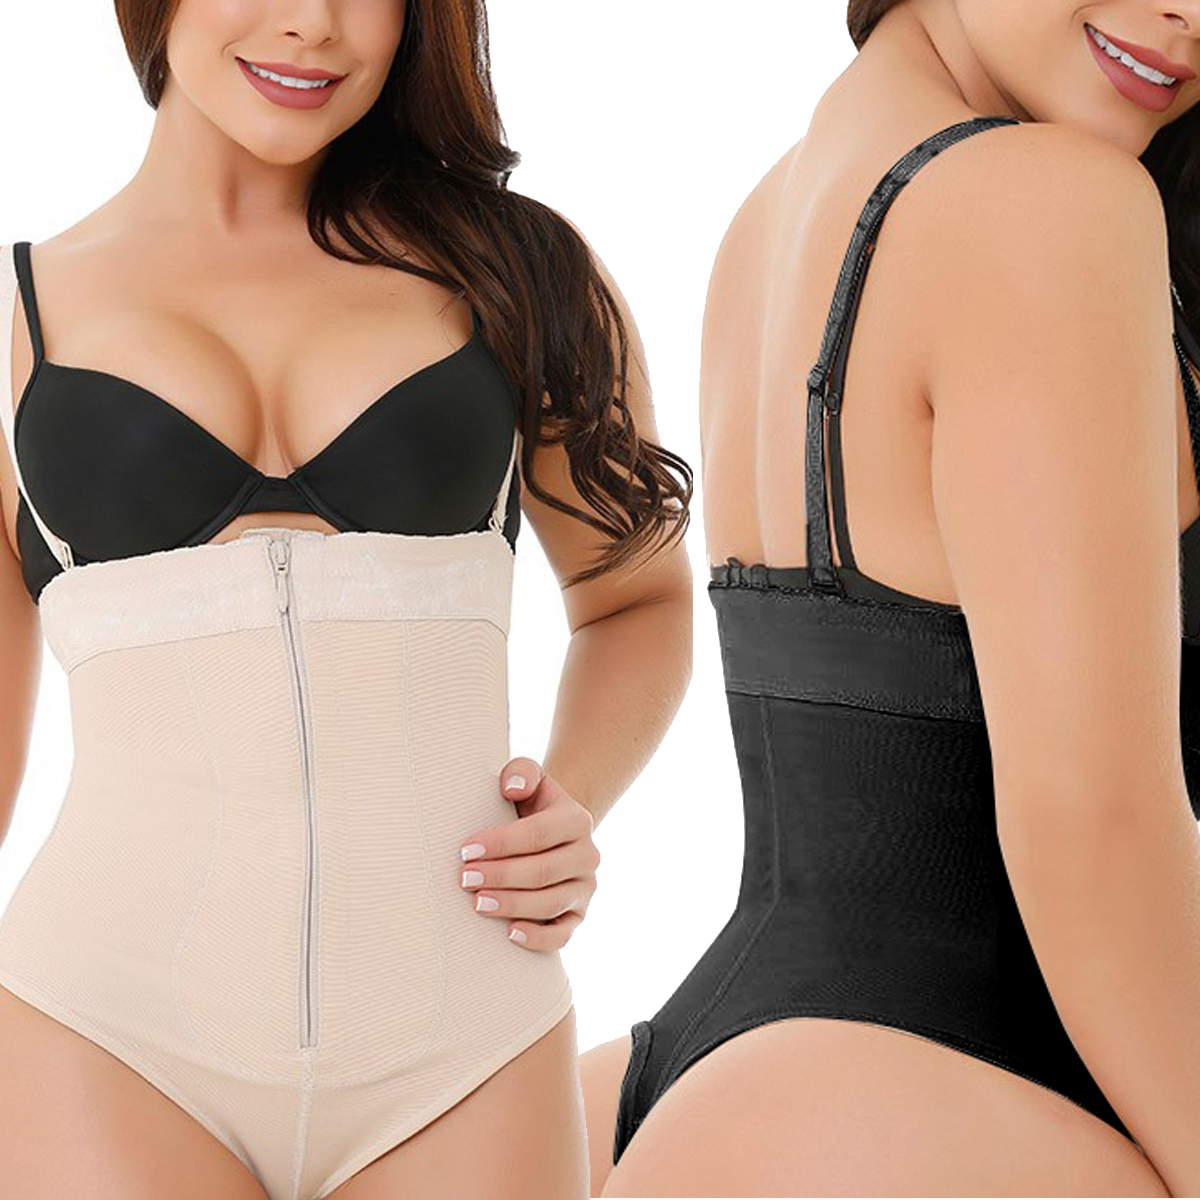 Ladies Firm Control Body Shaper Tummy Girdle Panty Knickers